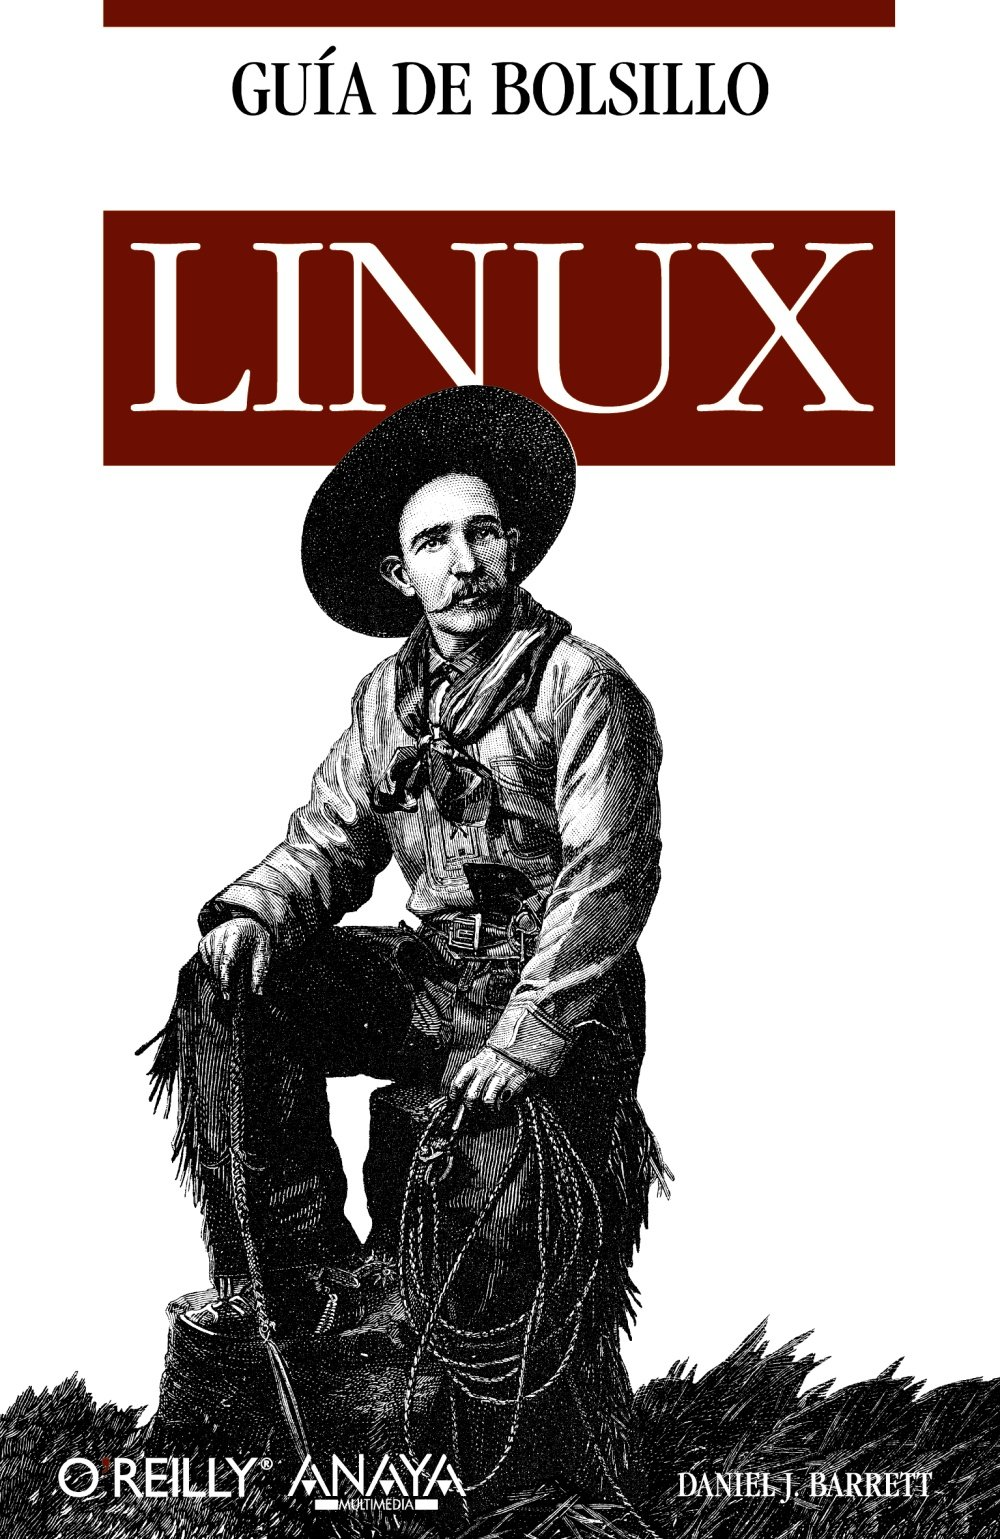 Guía de bolsillo de Linux (Anaya Multimedia/O´Reilly) Tapa blanda – 2 oct 2012 Daniel J. Barret 844153215X Operating Systems - Linux Spanish: Adult Nonfiction